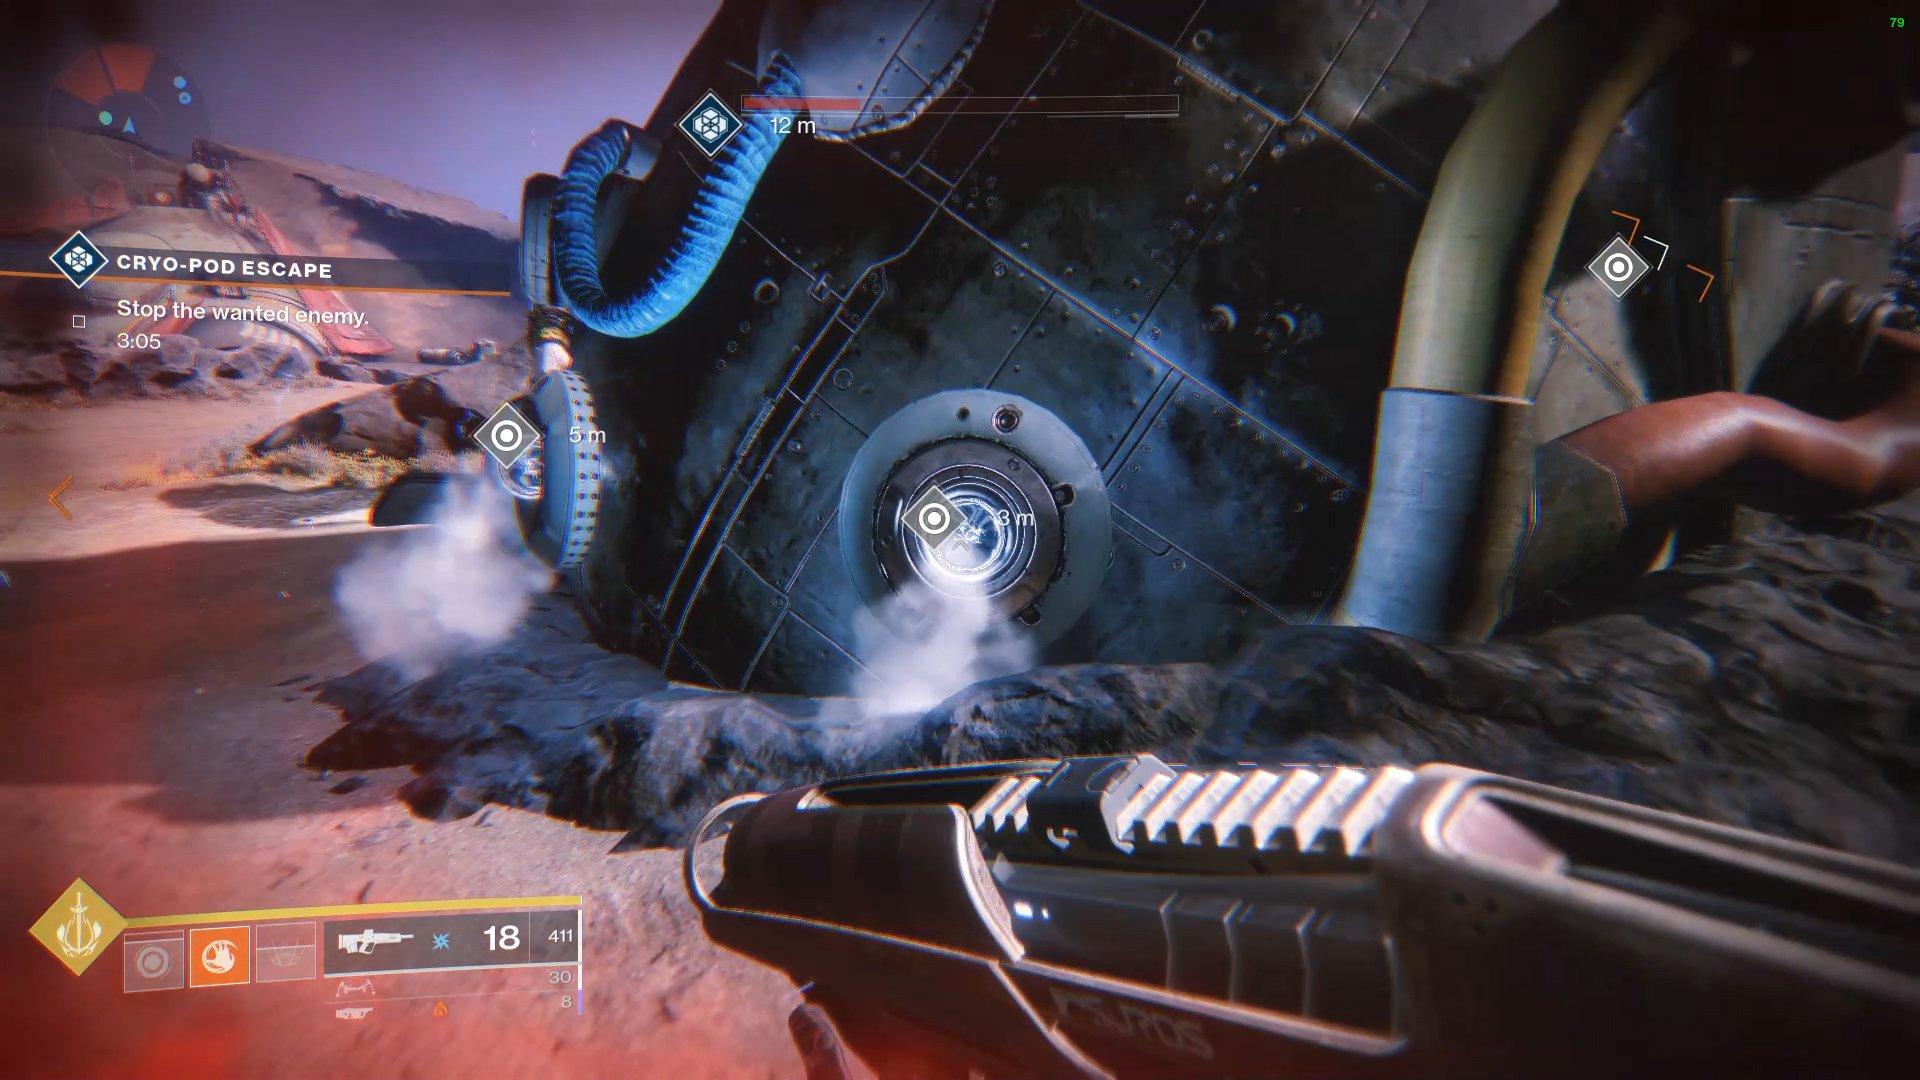 Destiny 2 Cryo-Pod Escape Public Event